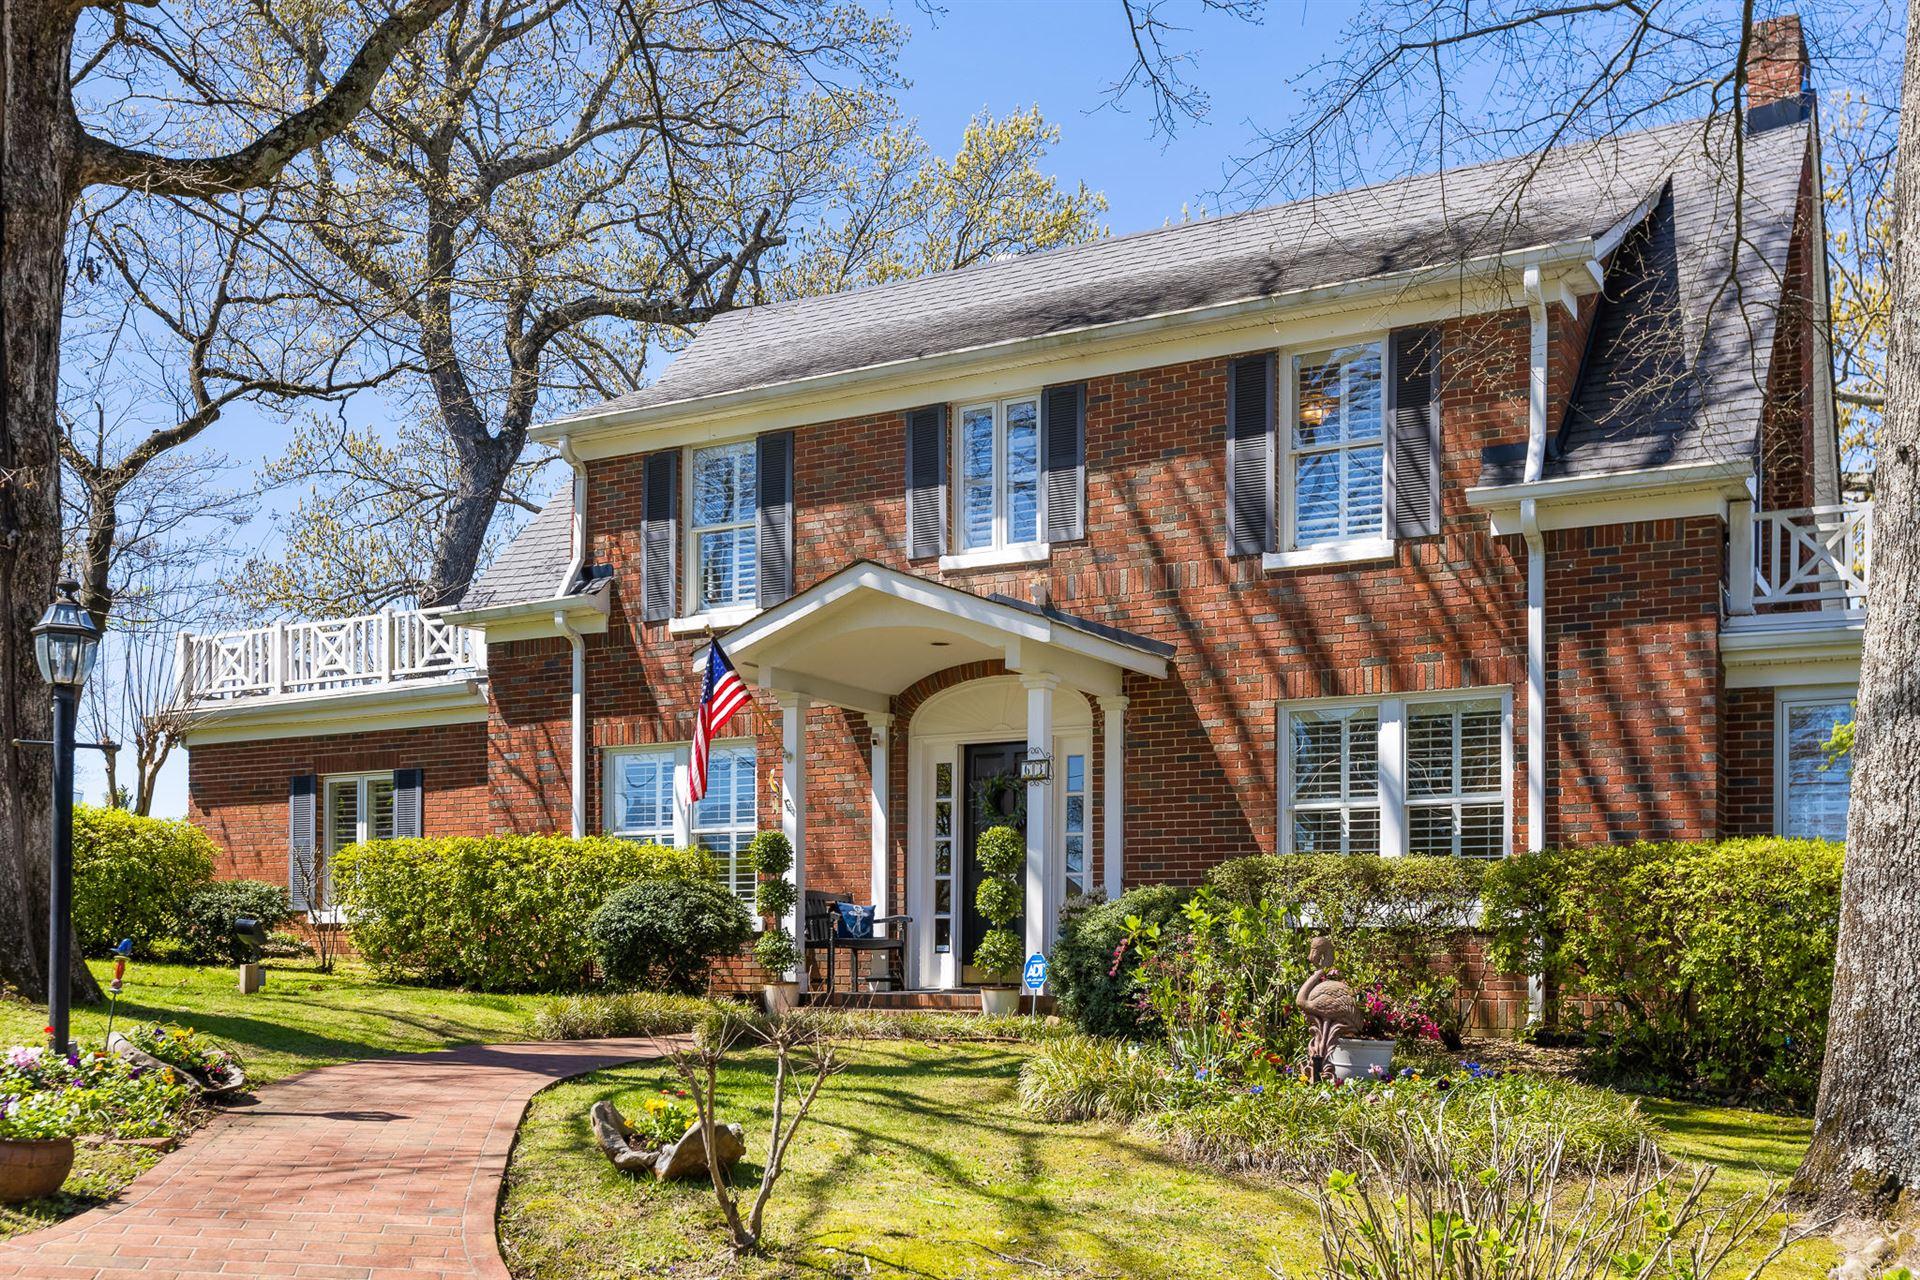 63 S Crest Rd, Chattanooga, TN 37404 - MLS#: 1333364